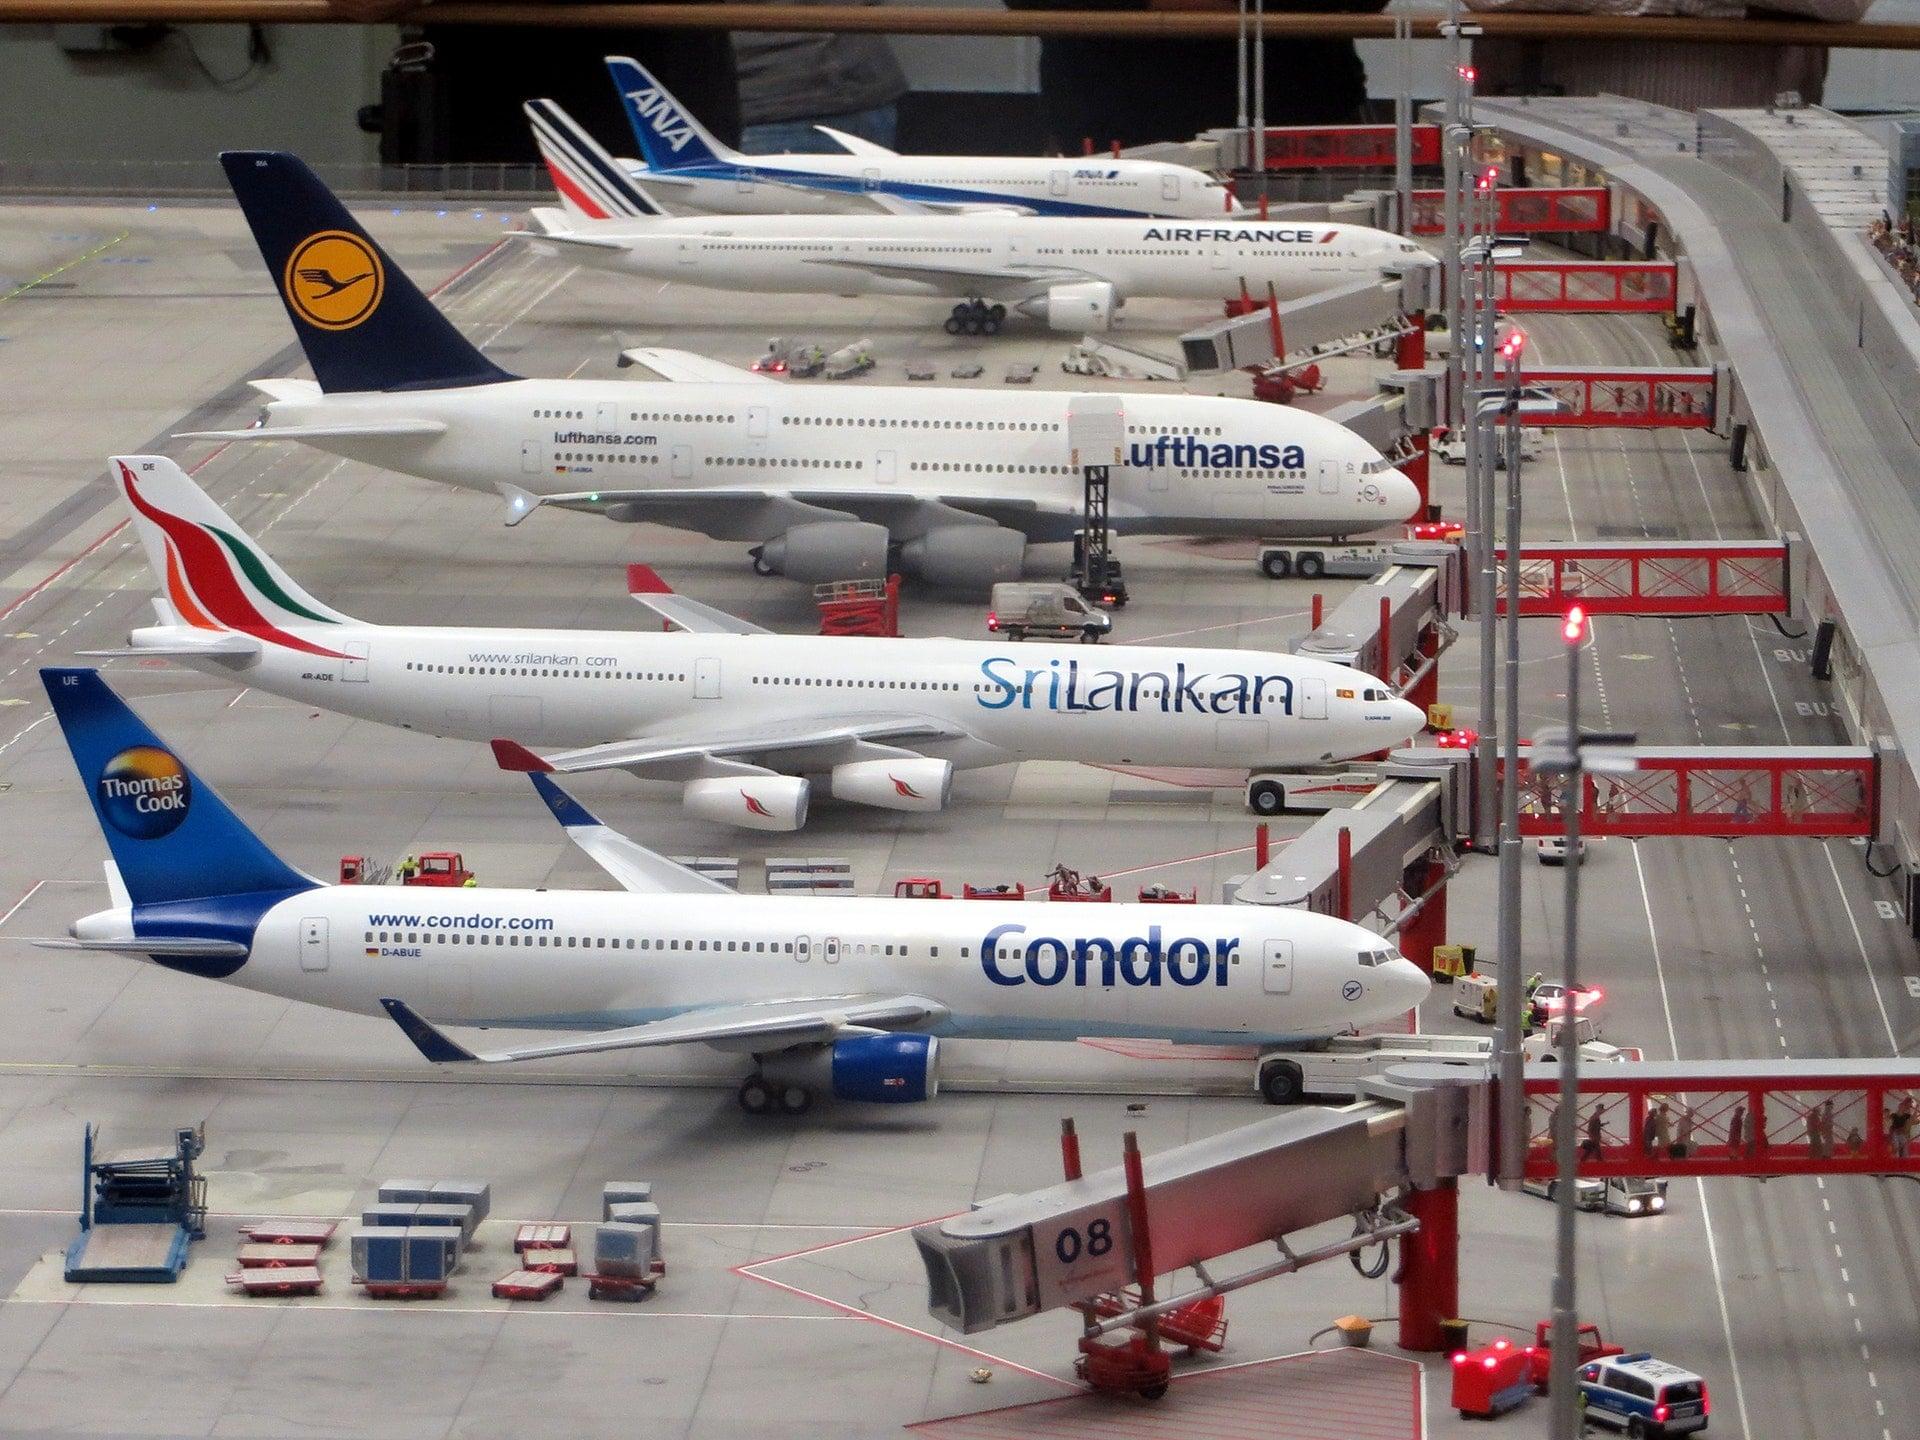 podróż samolot Condor SriLankan Lufthansa Air France